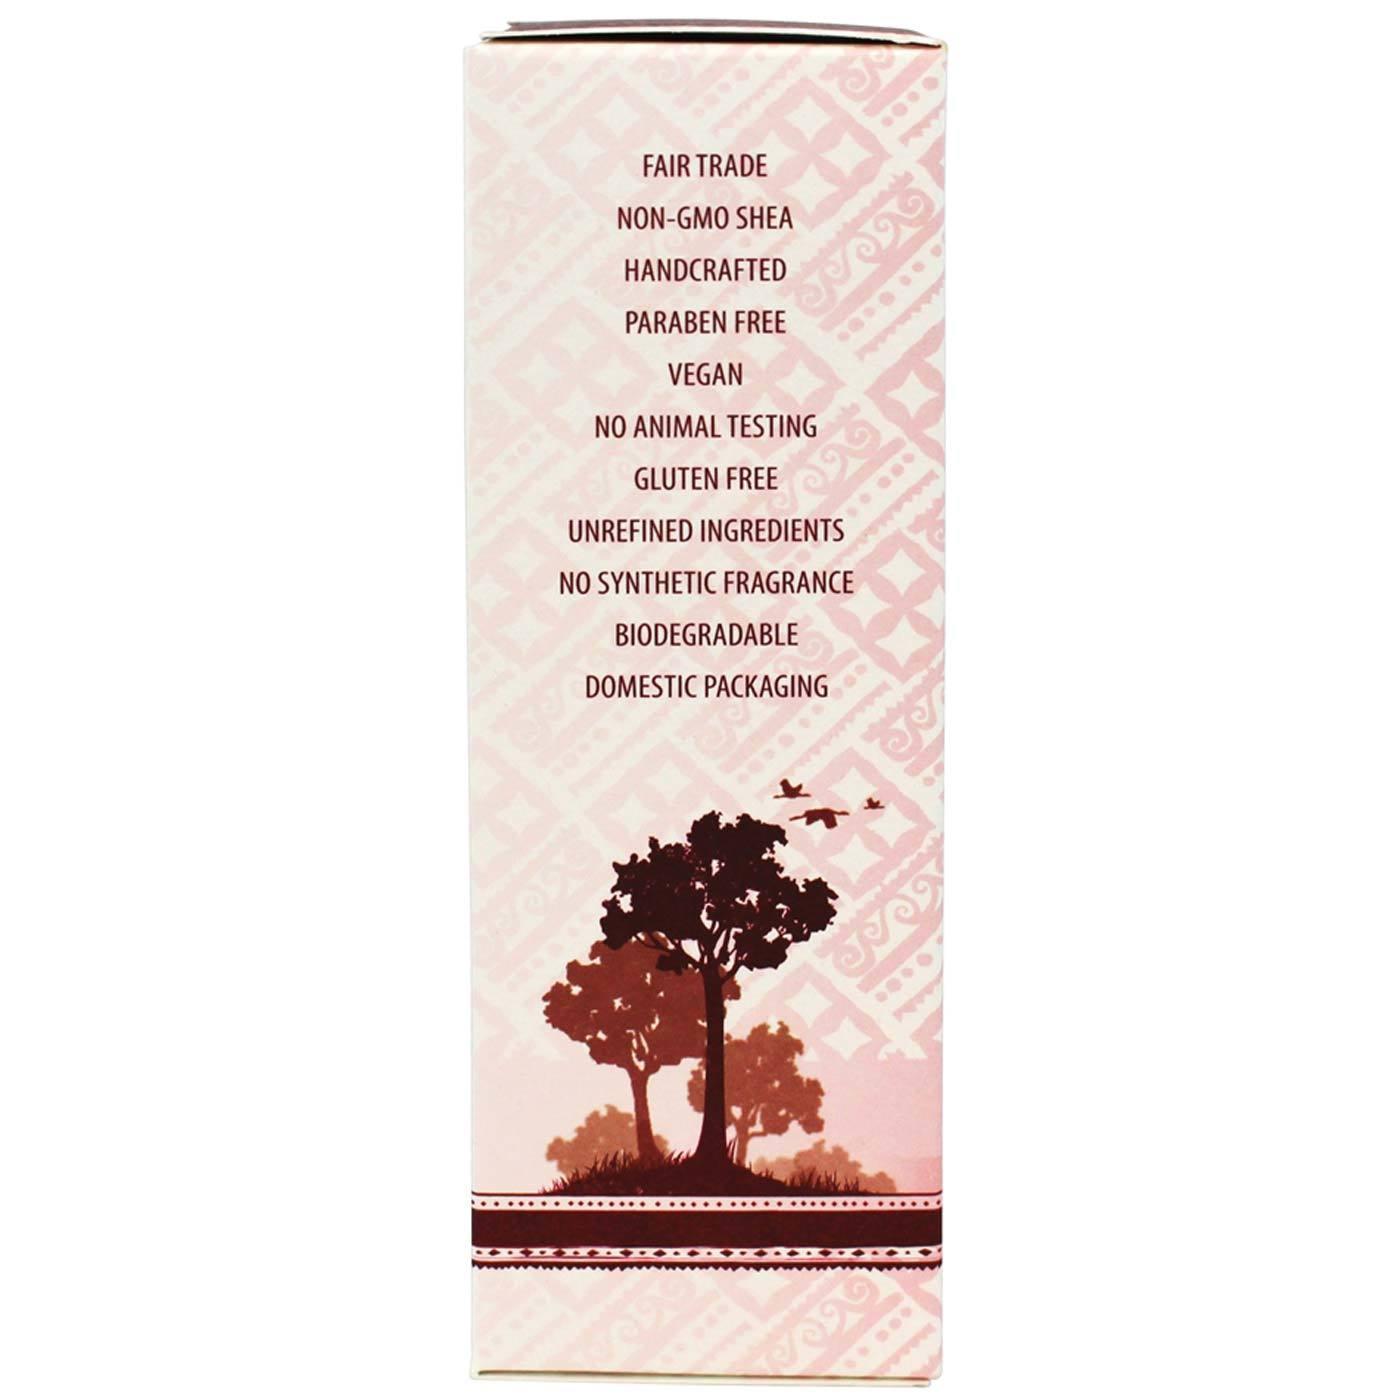 Alaffia Skin Renewal Facial Toner - Baobab & Shea - 3.4 oz Buddhas Herbs Skin Detox Tea with Hibiscus and Cinnamon, 88 Tea Bags (Pack of 4)